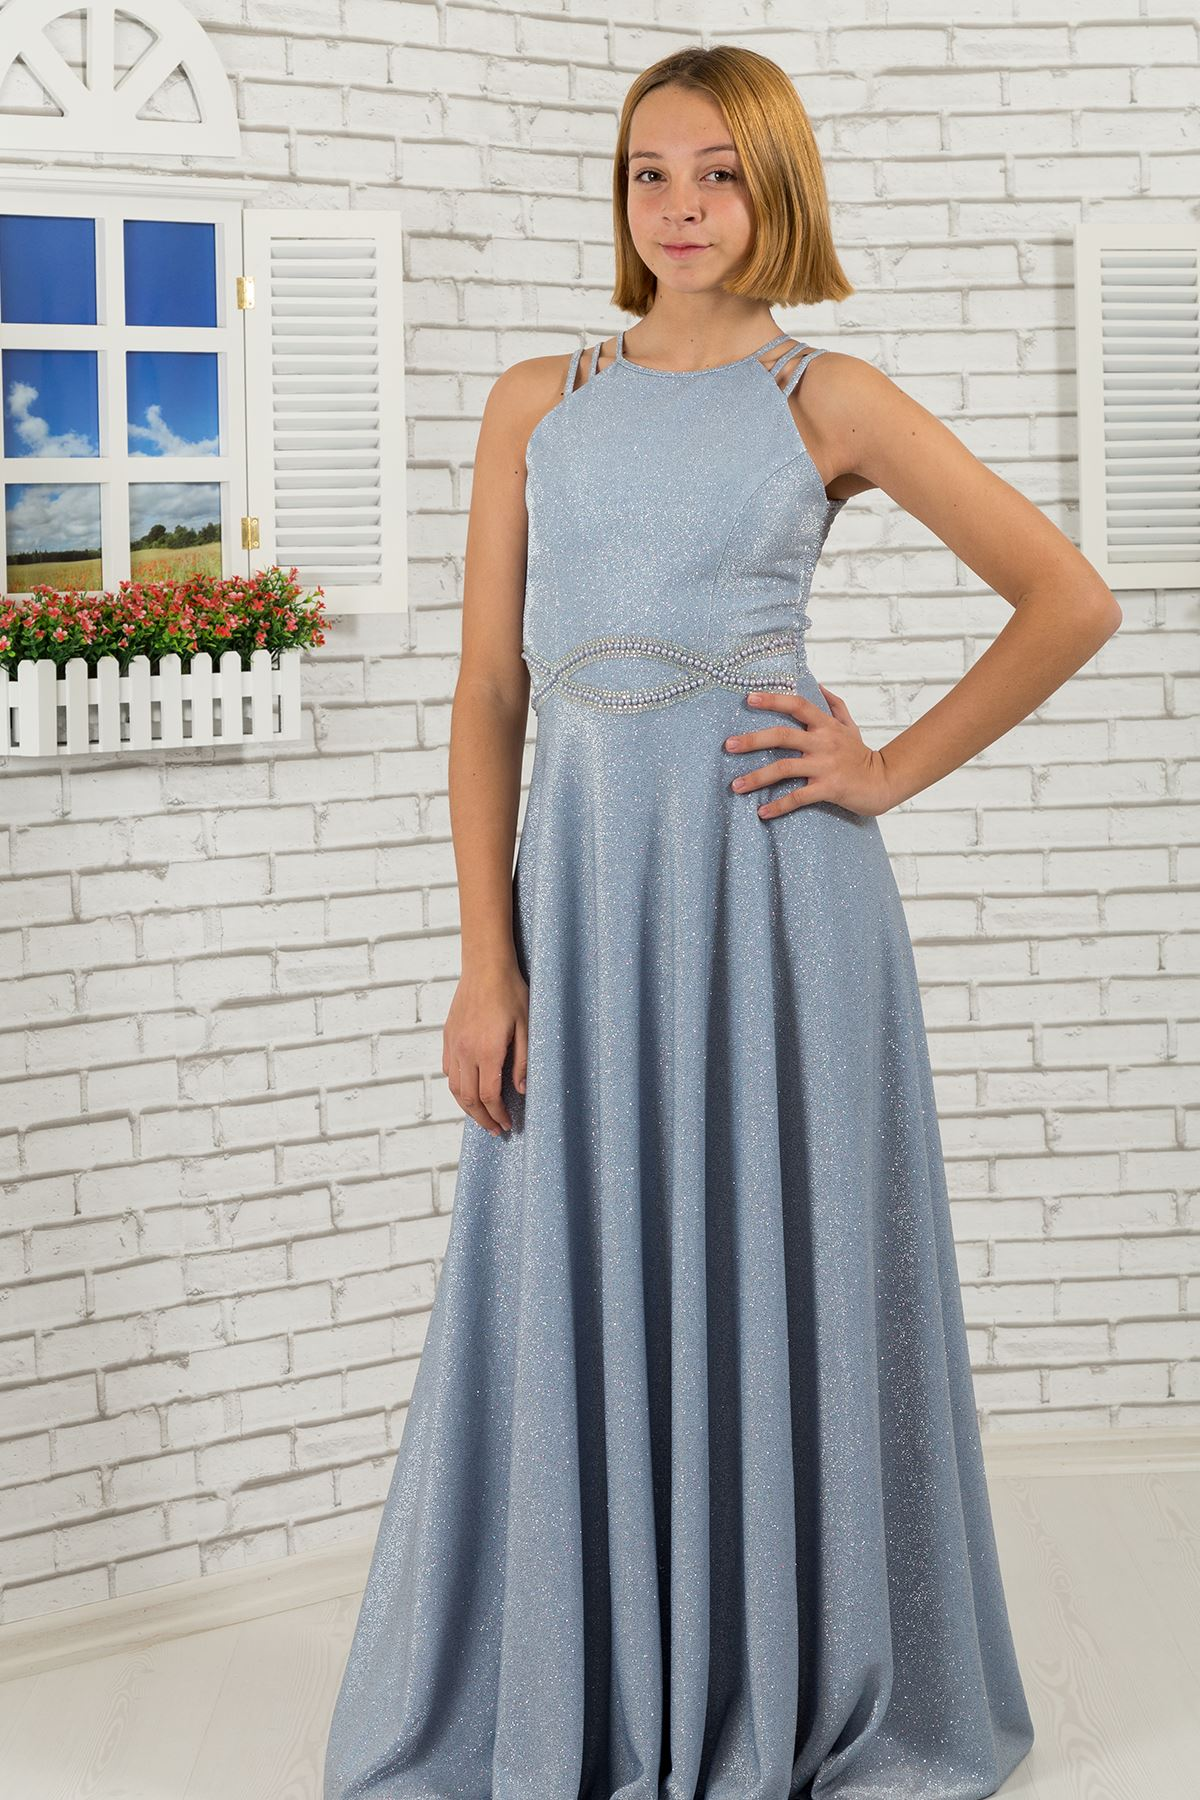 Waist print stone, shoulder detail, custom silvery fabric girl children evening dress 511 Baby Blue